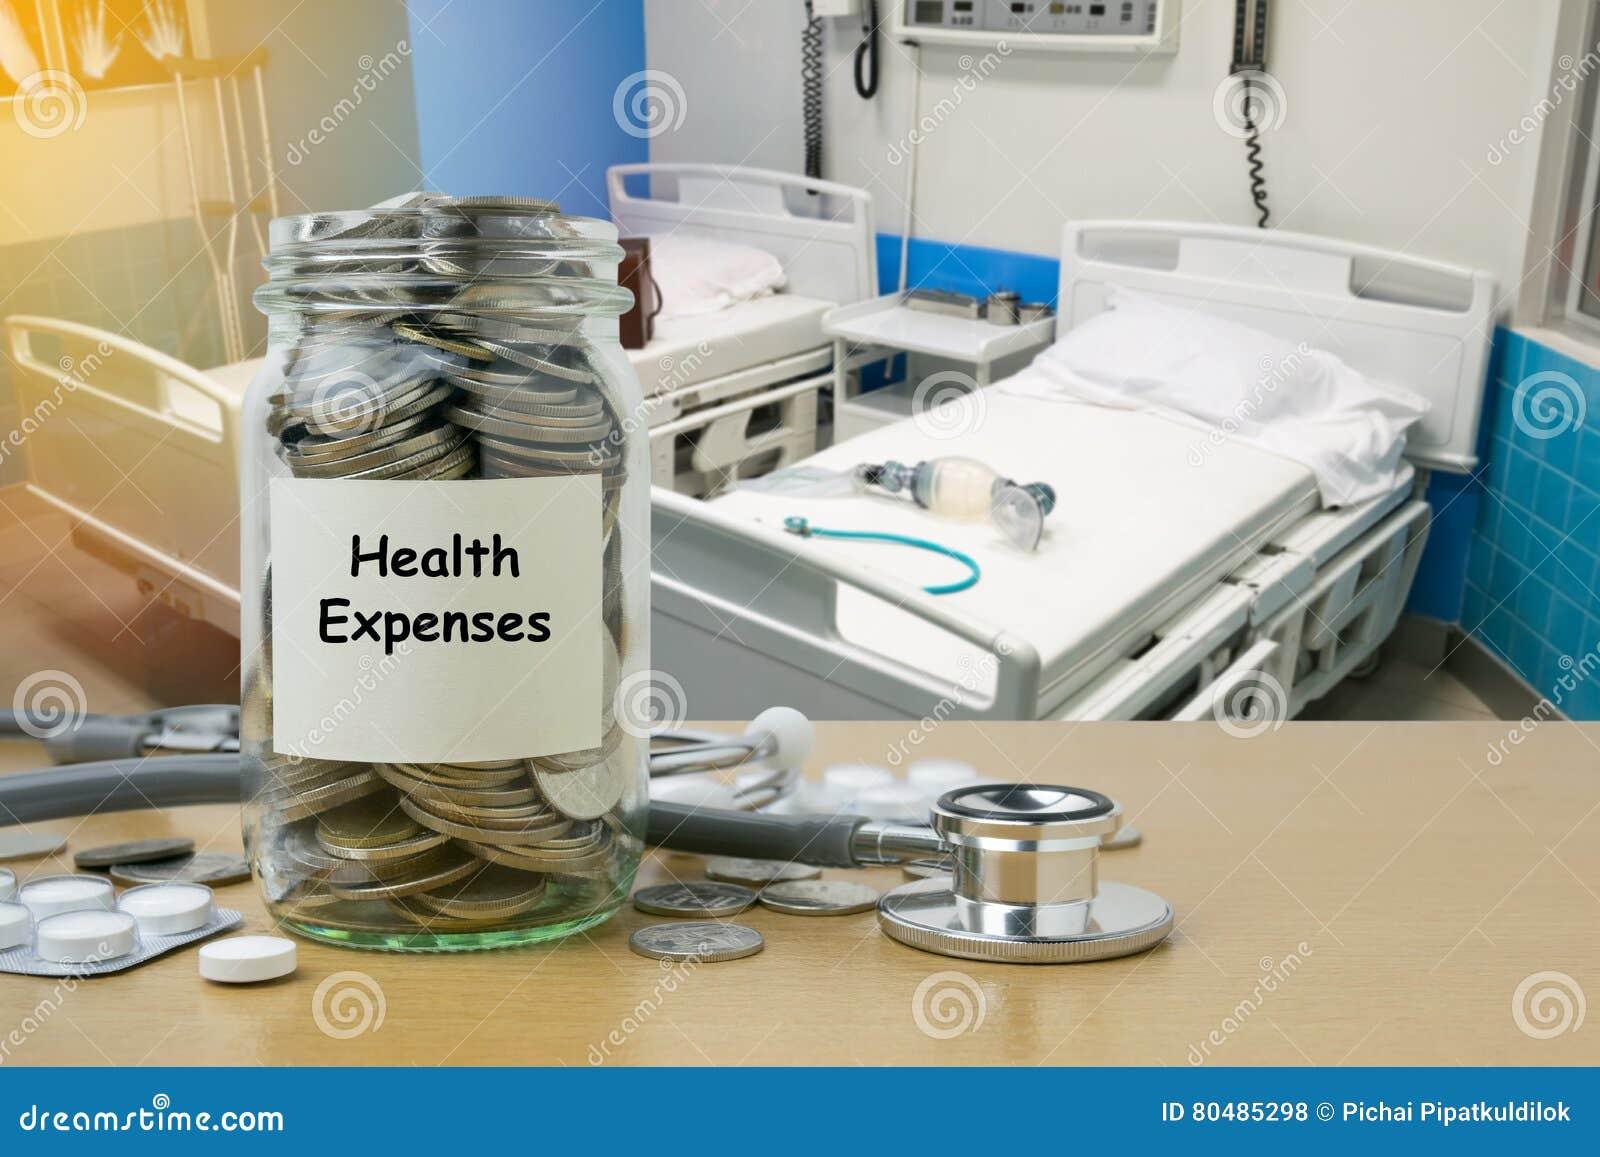 Money saving for Health expenses